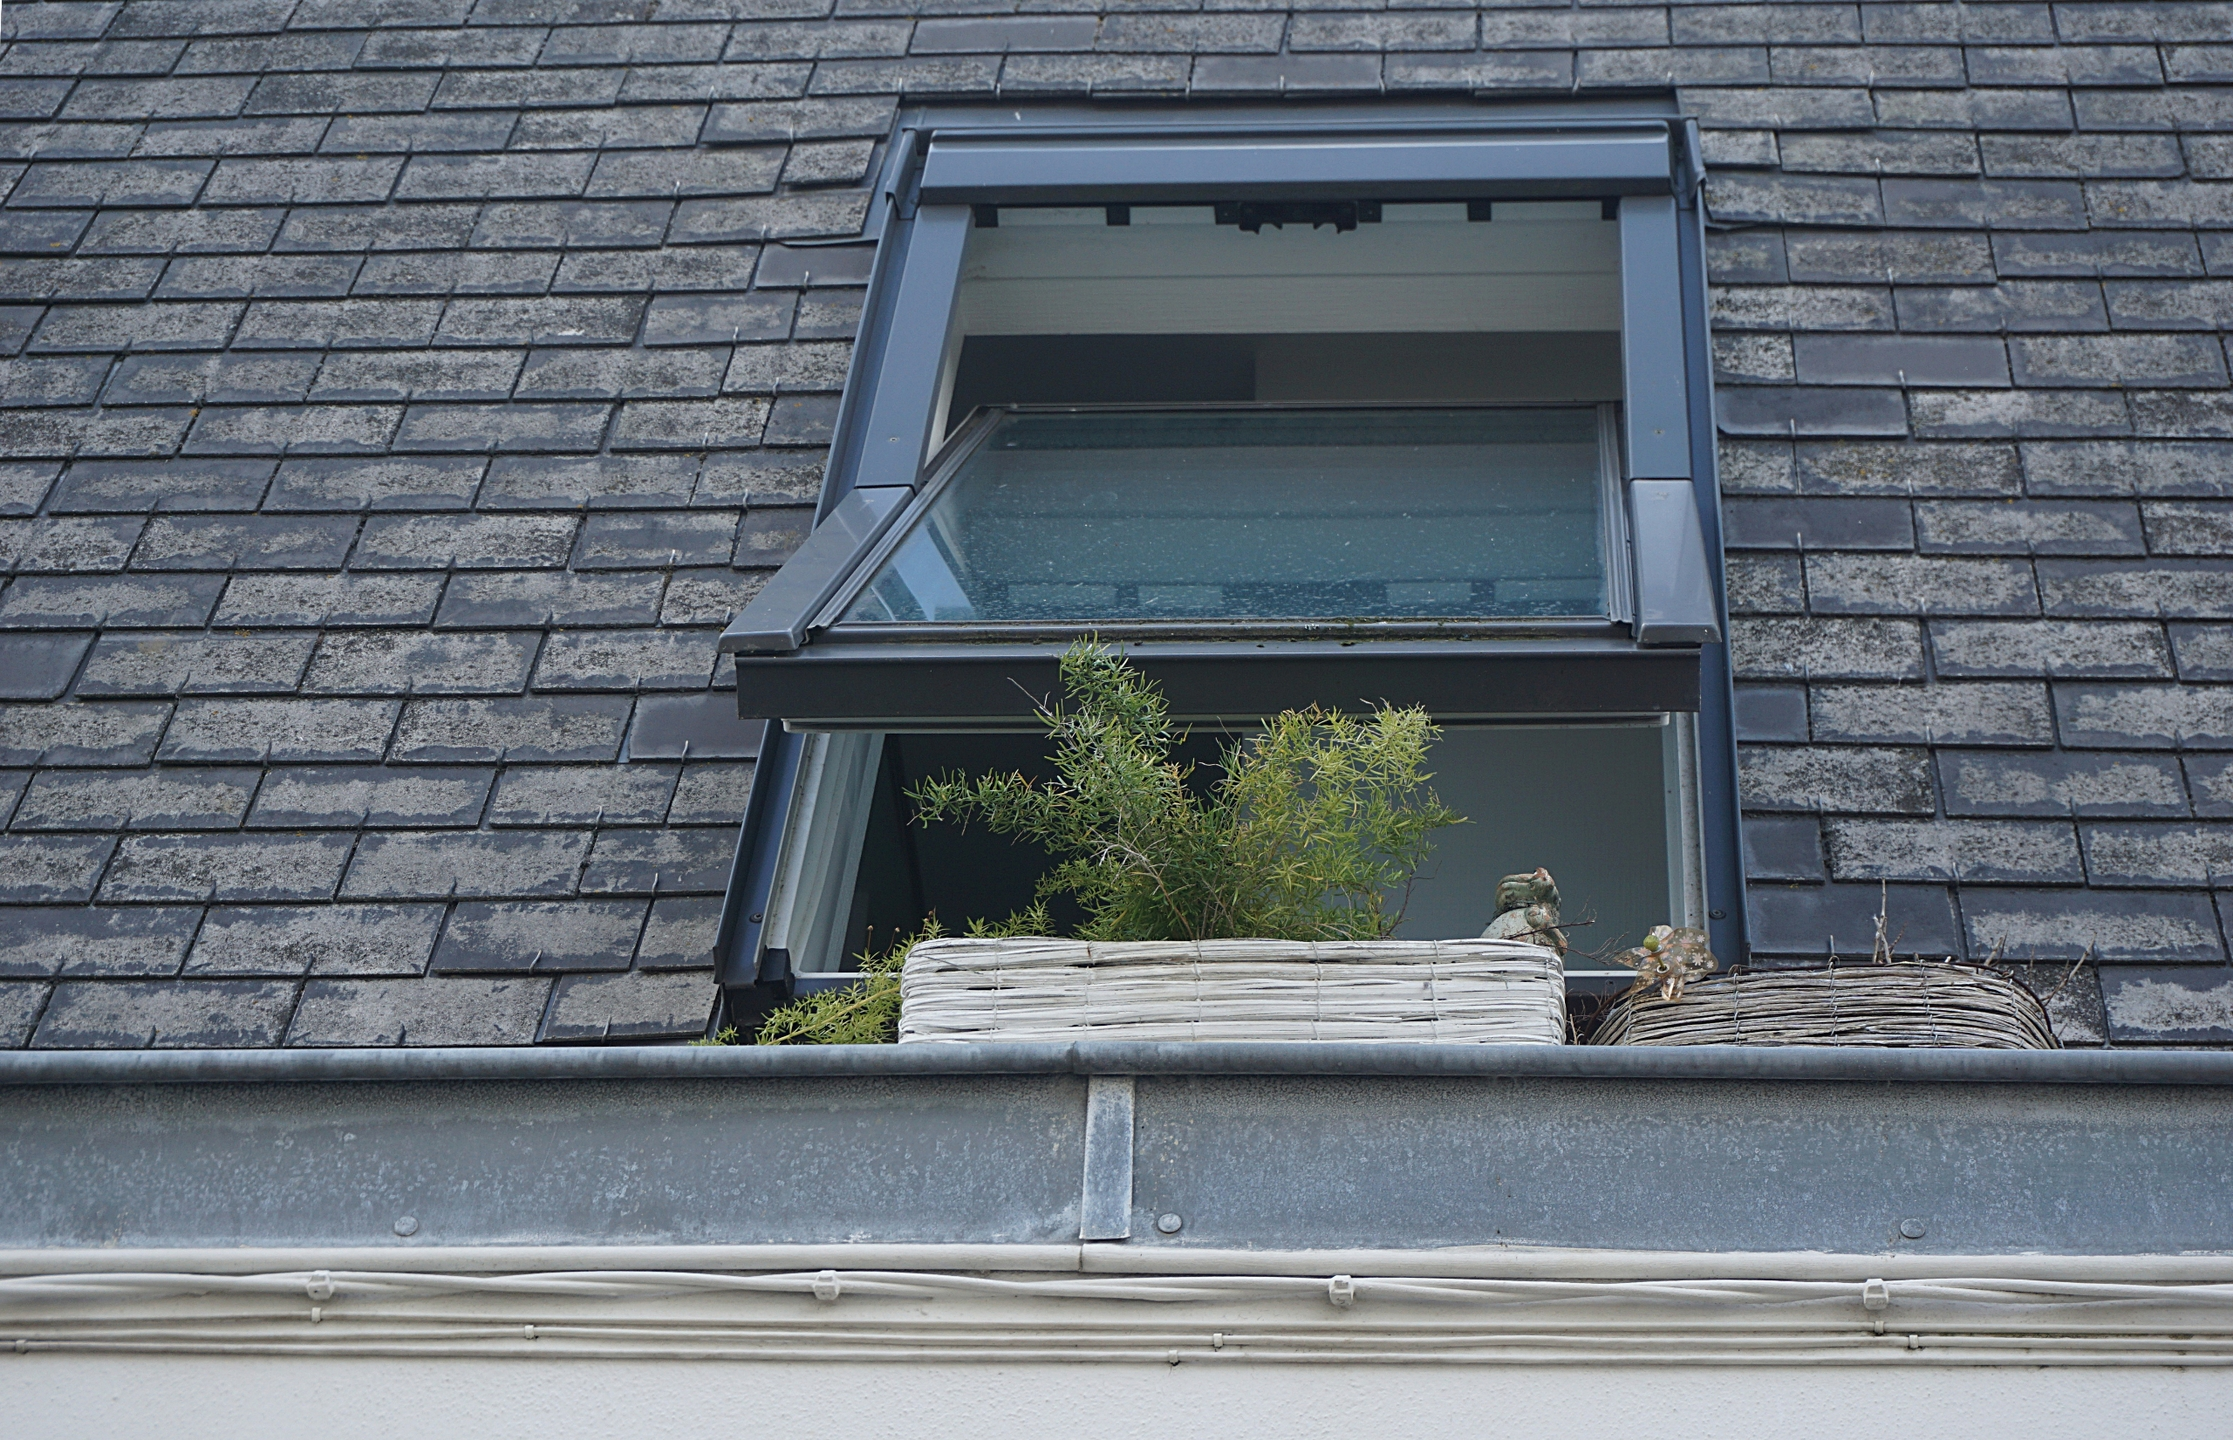 Watertight Worthing Roofing (@watertightworthingroofing) Cover Image